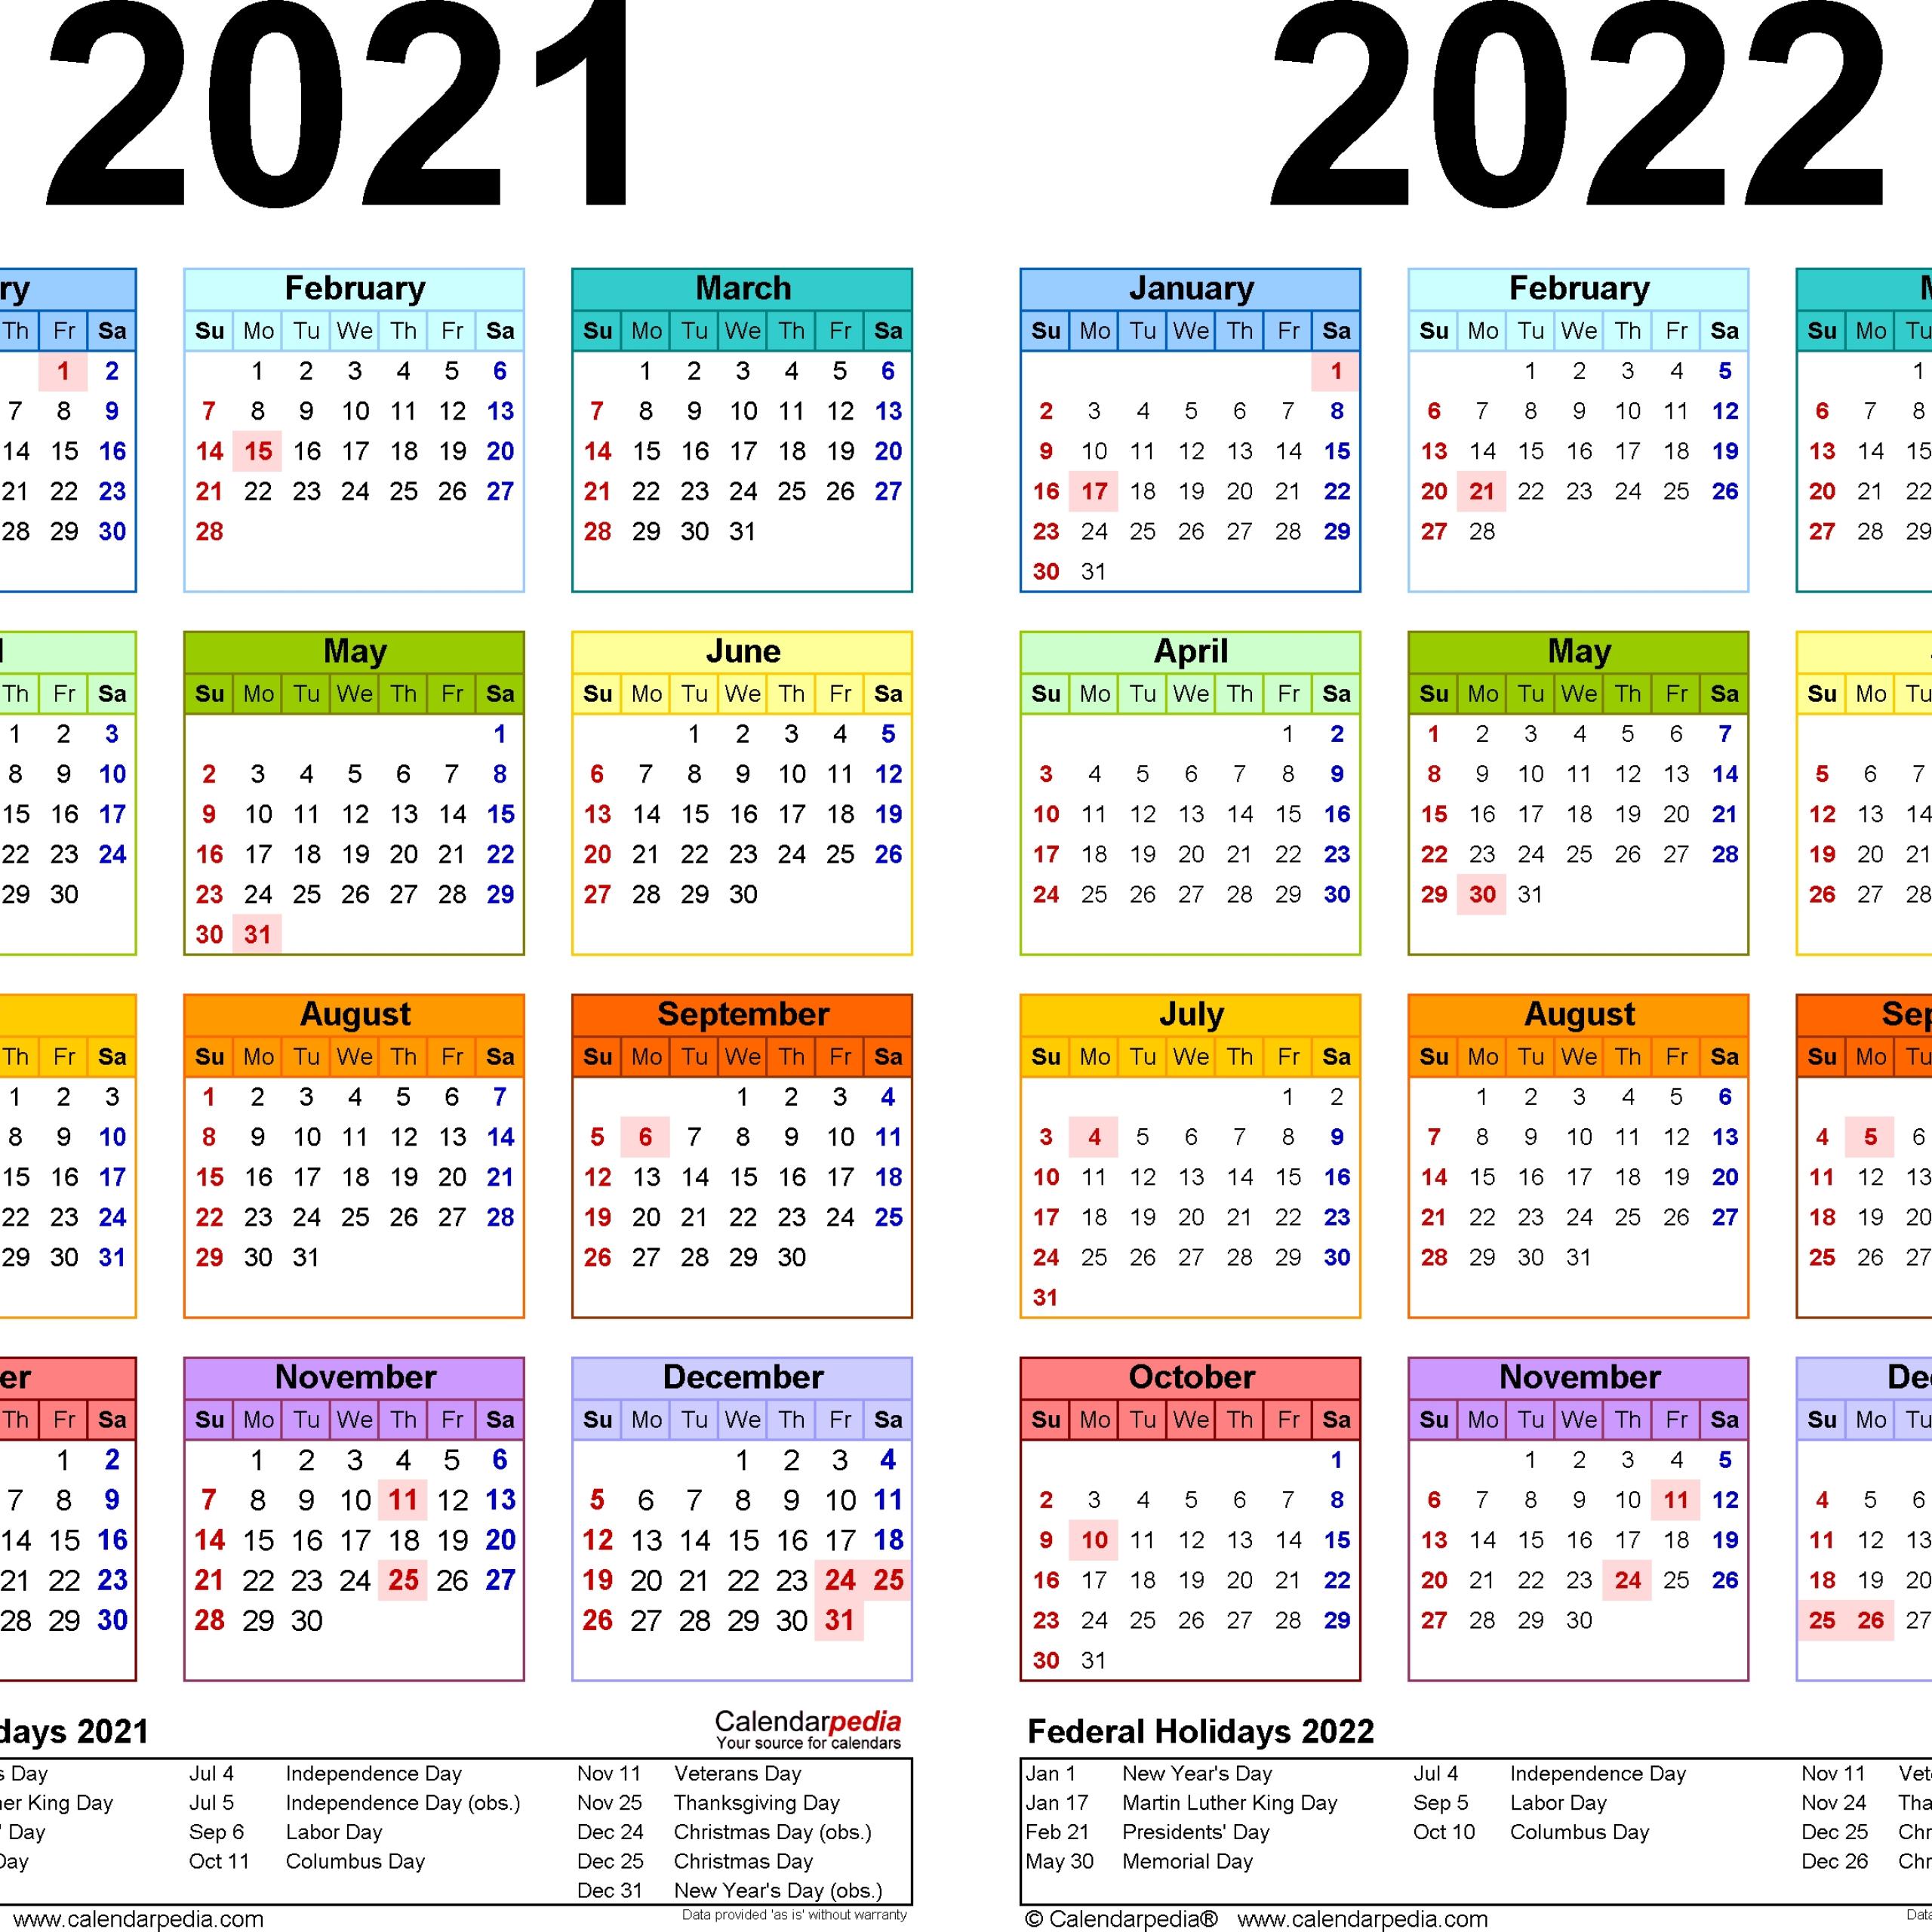 Calendar 2021 South Africa Holidays Avnitasoni